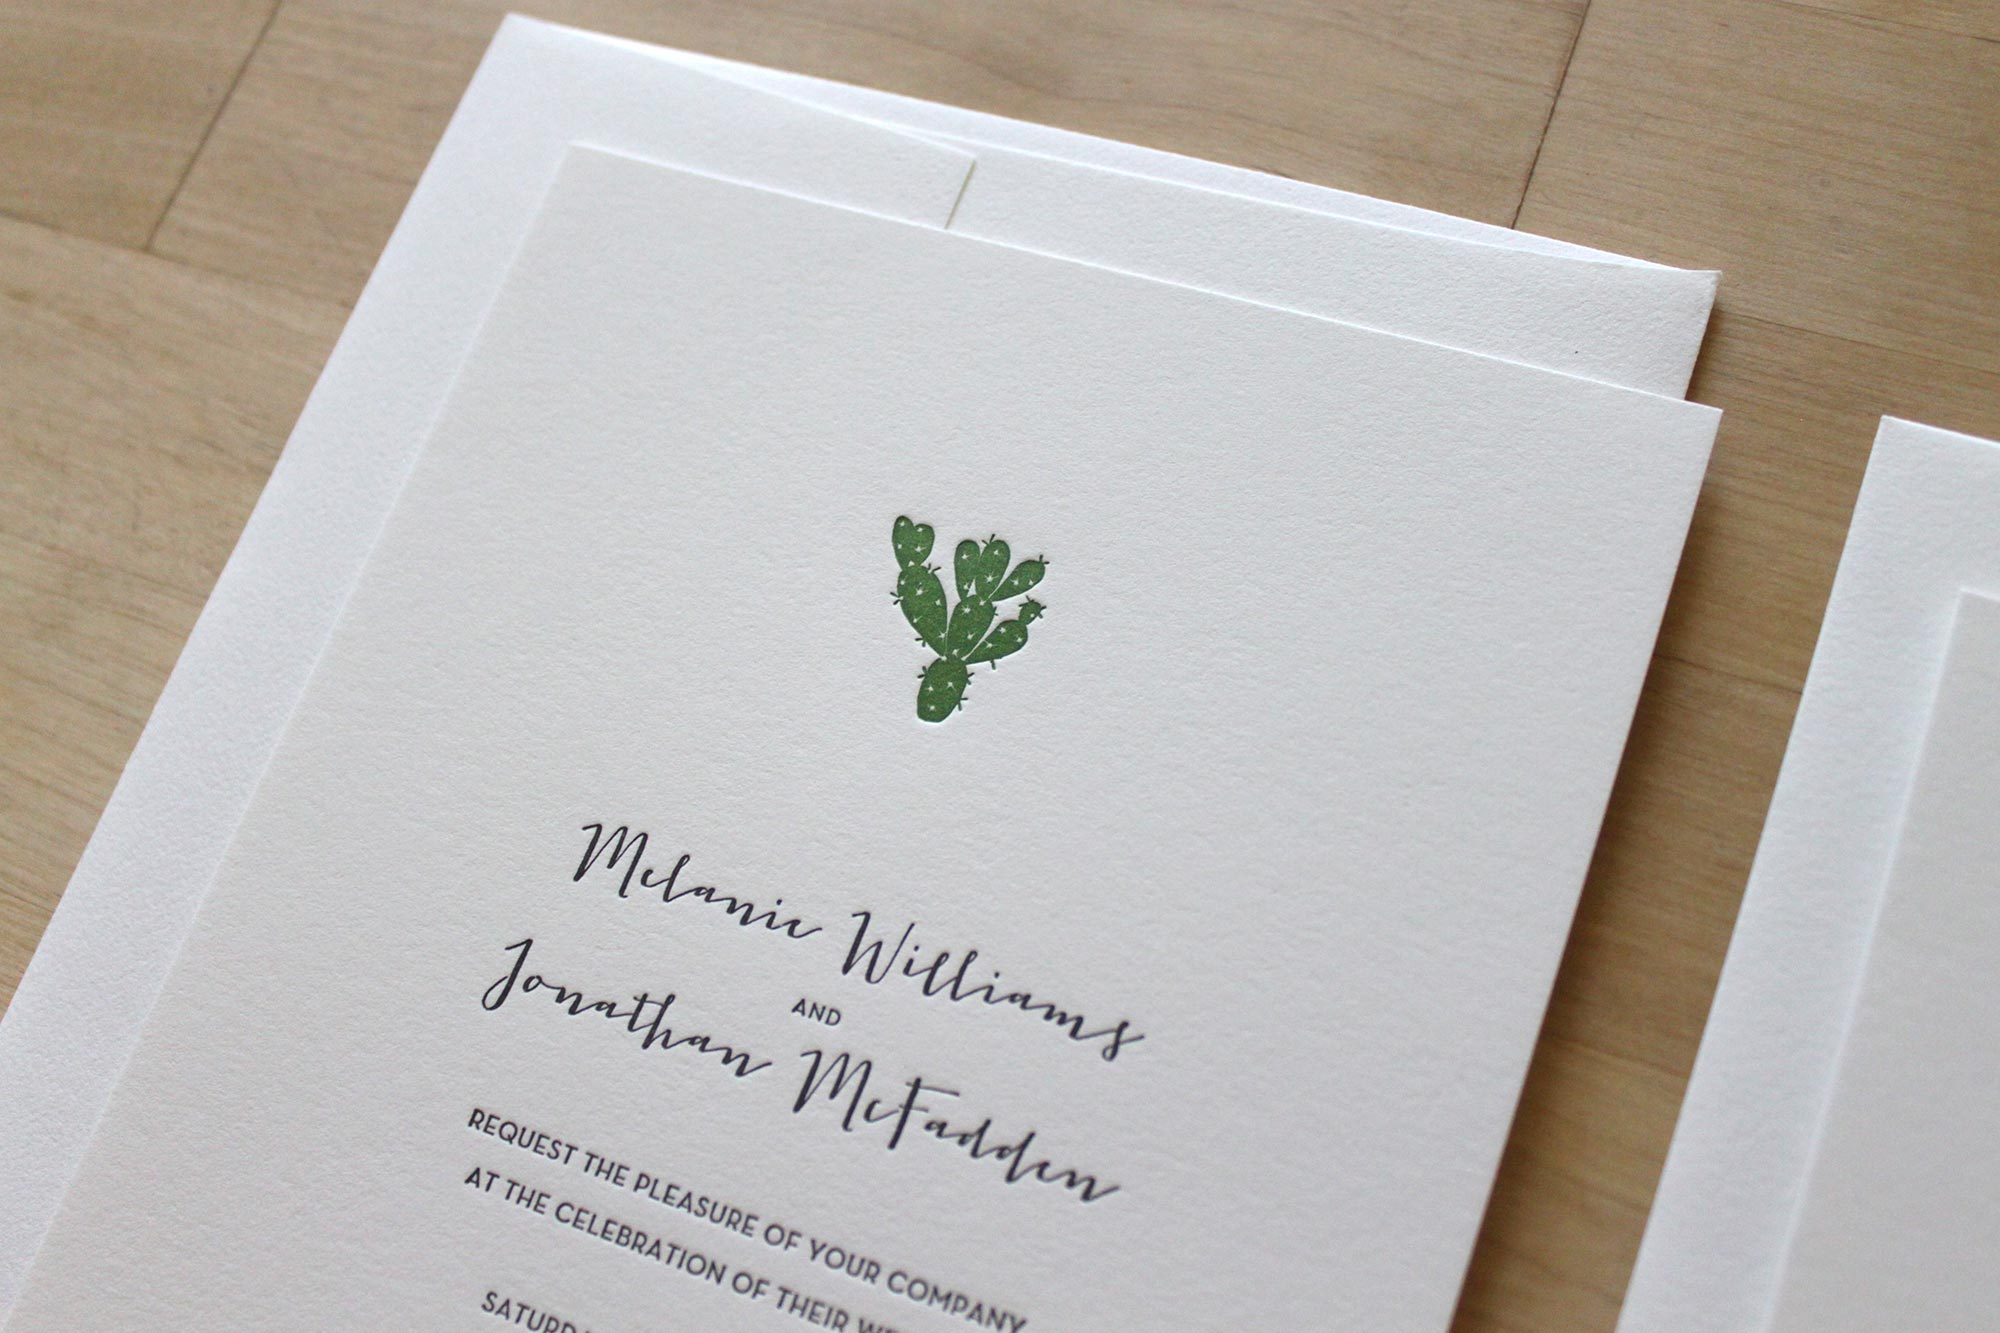 Cactus-3-letterpress-wedding-invitations.jpg